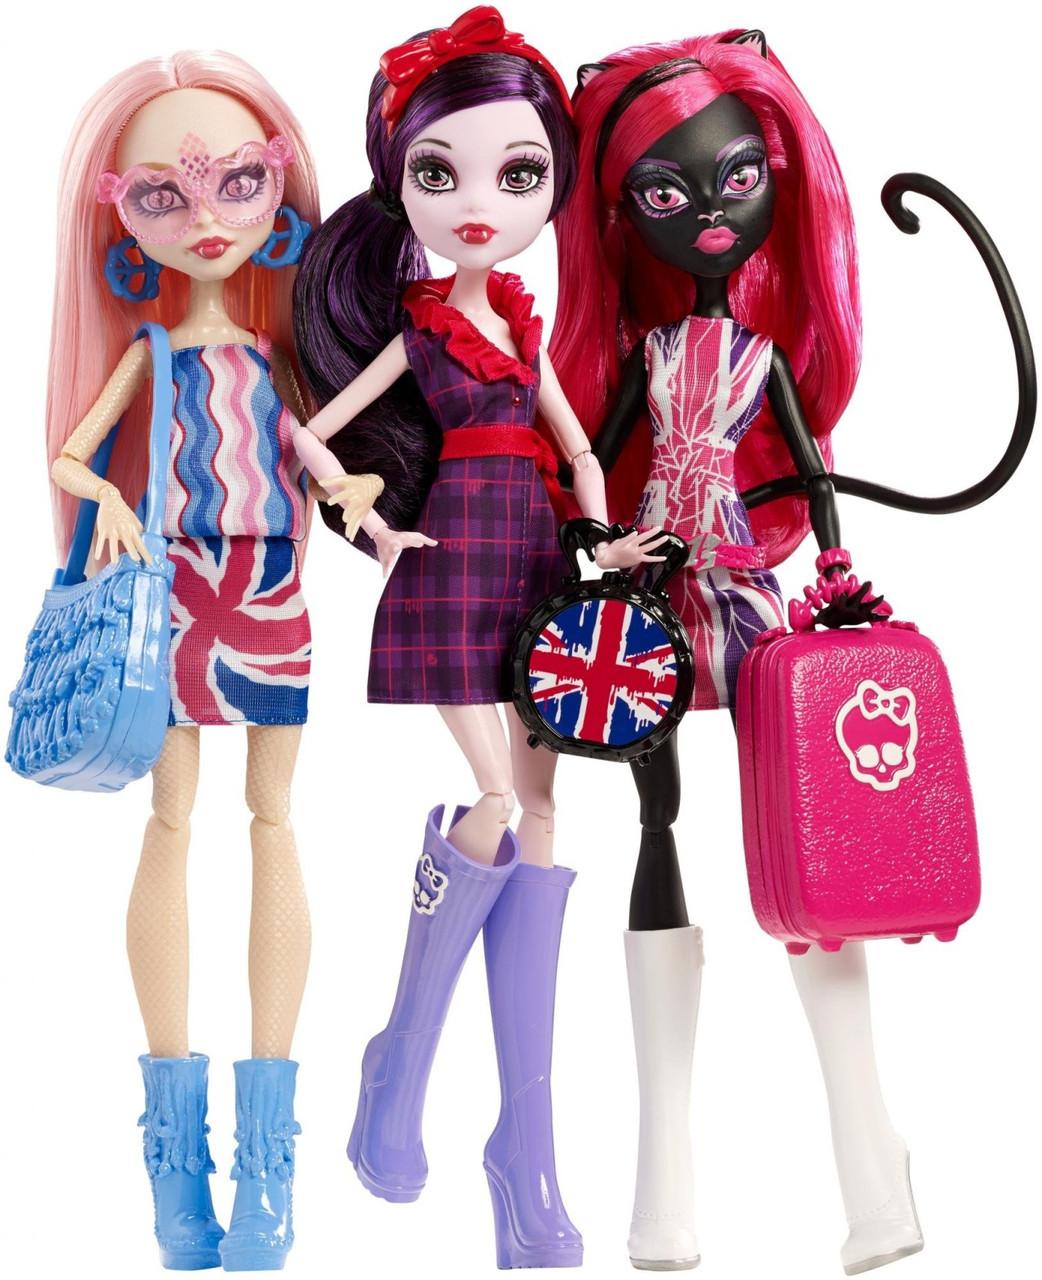 Набор кукол Монстер Хай из серии Монстрозвезды в Лондуме, Monster High Ghoulebrities in Londoom.